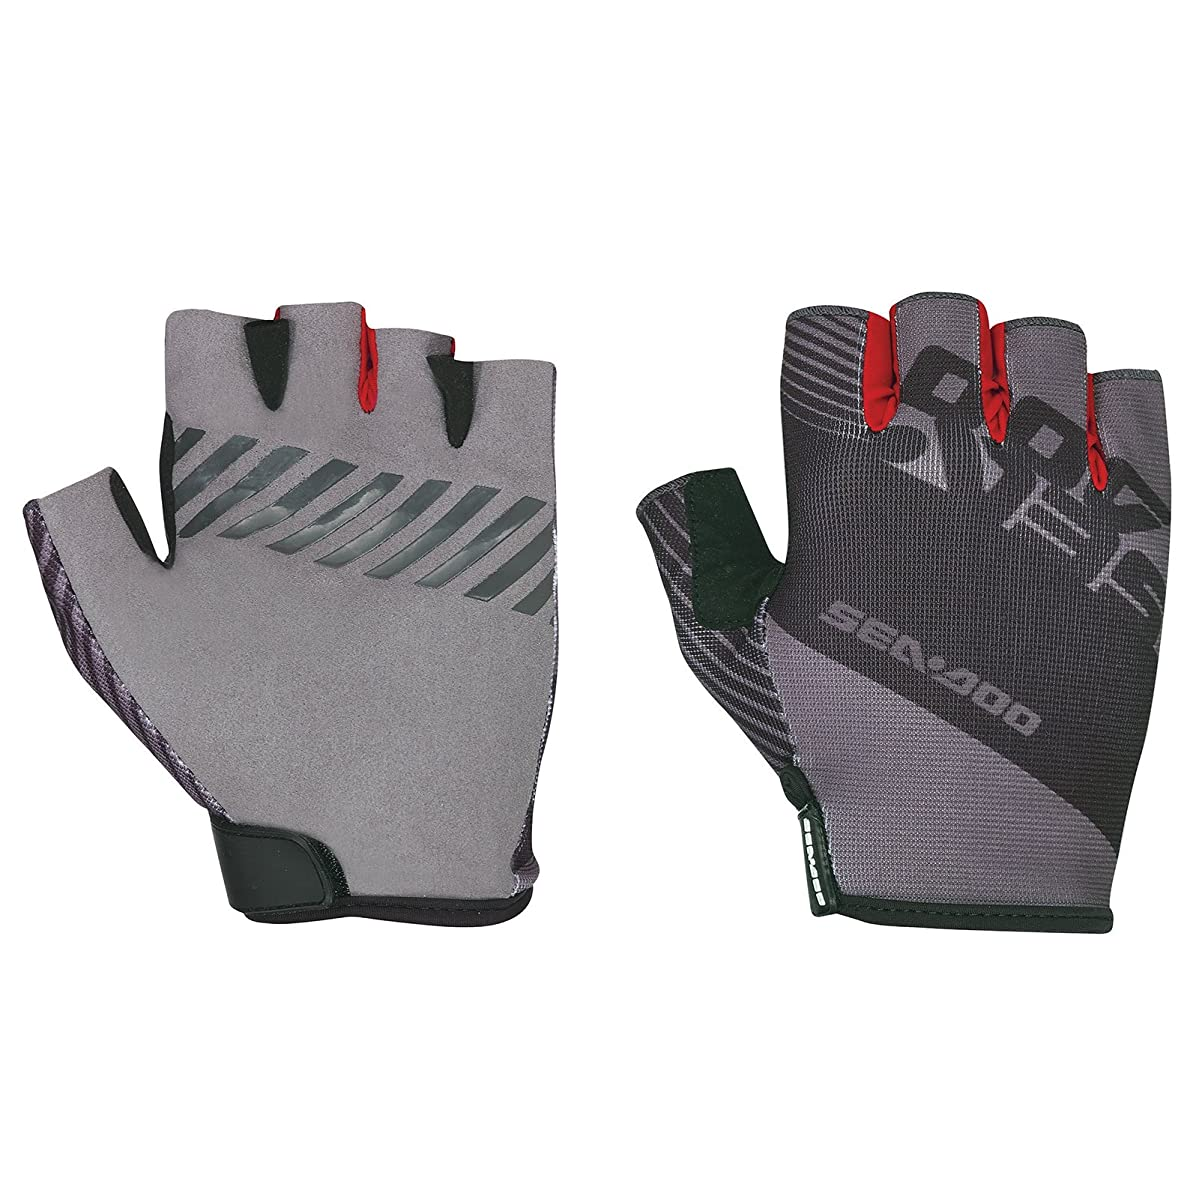 Sea Doo Attitude Shorty Gloves (Large)